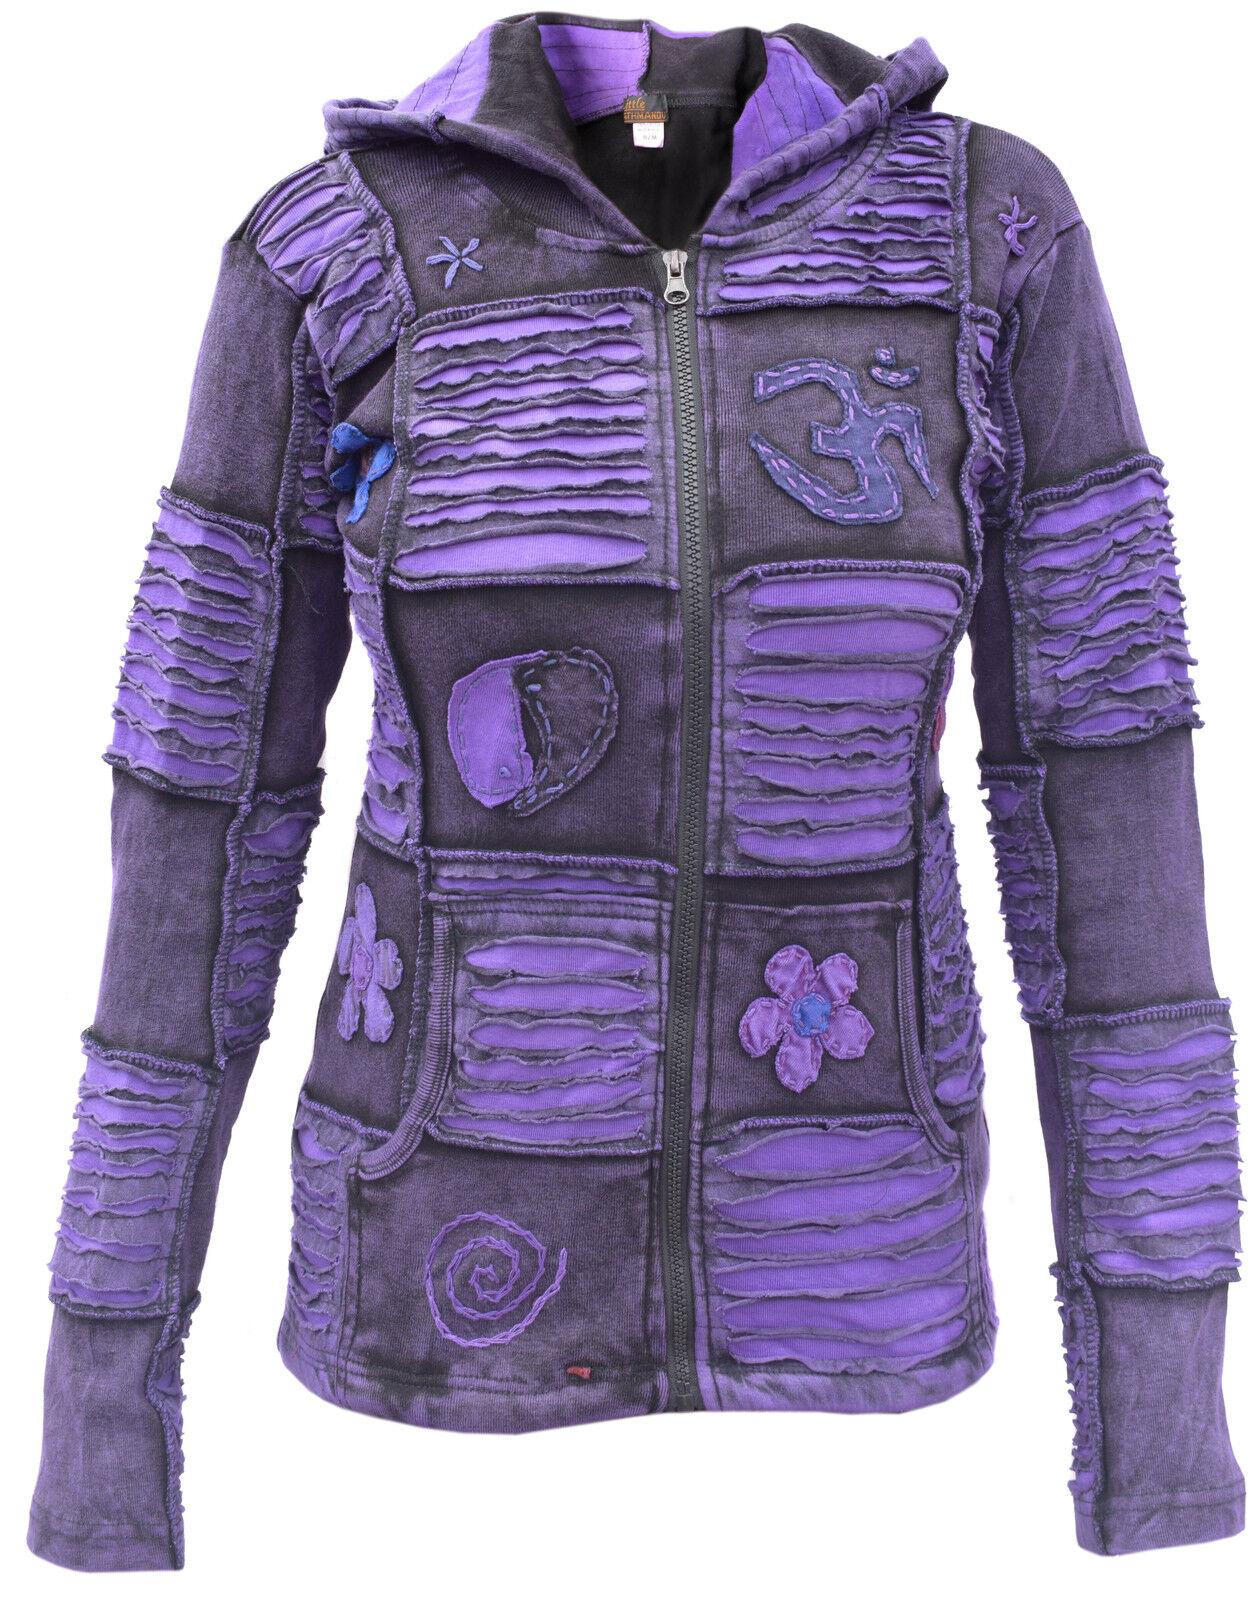 Cotton Jacket Stonewash Hippie Boho Gothic Emo Funky Patchwork Pixie Zip Hoodie